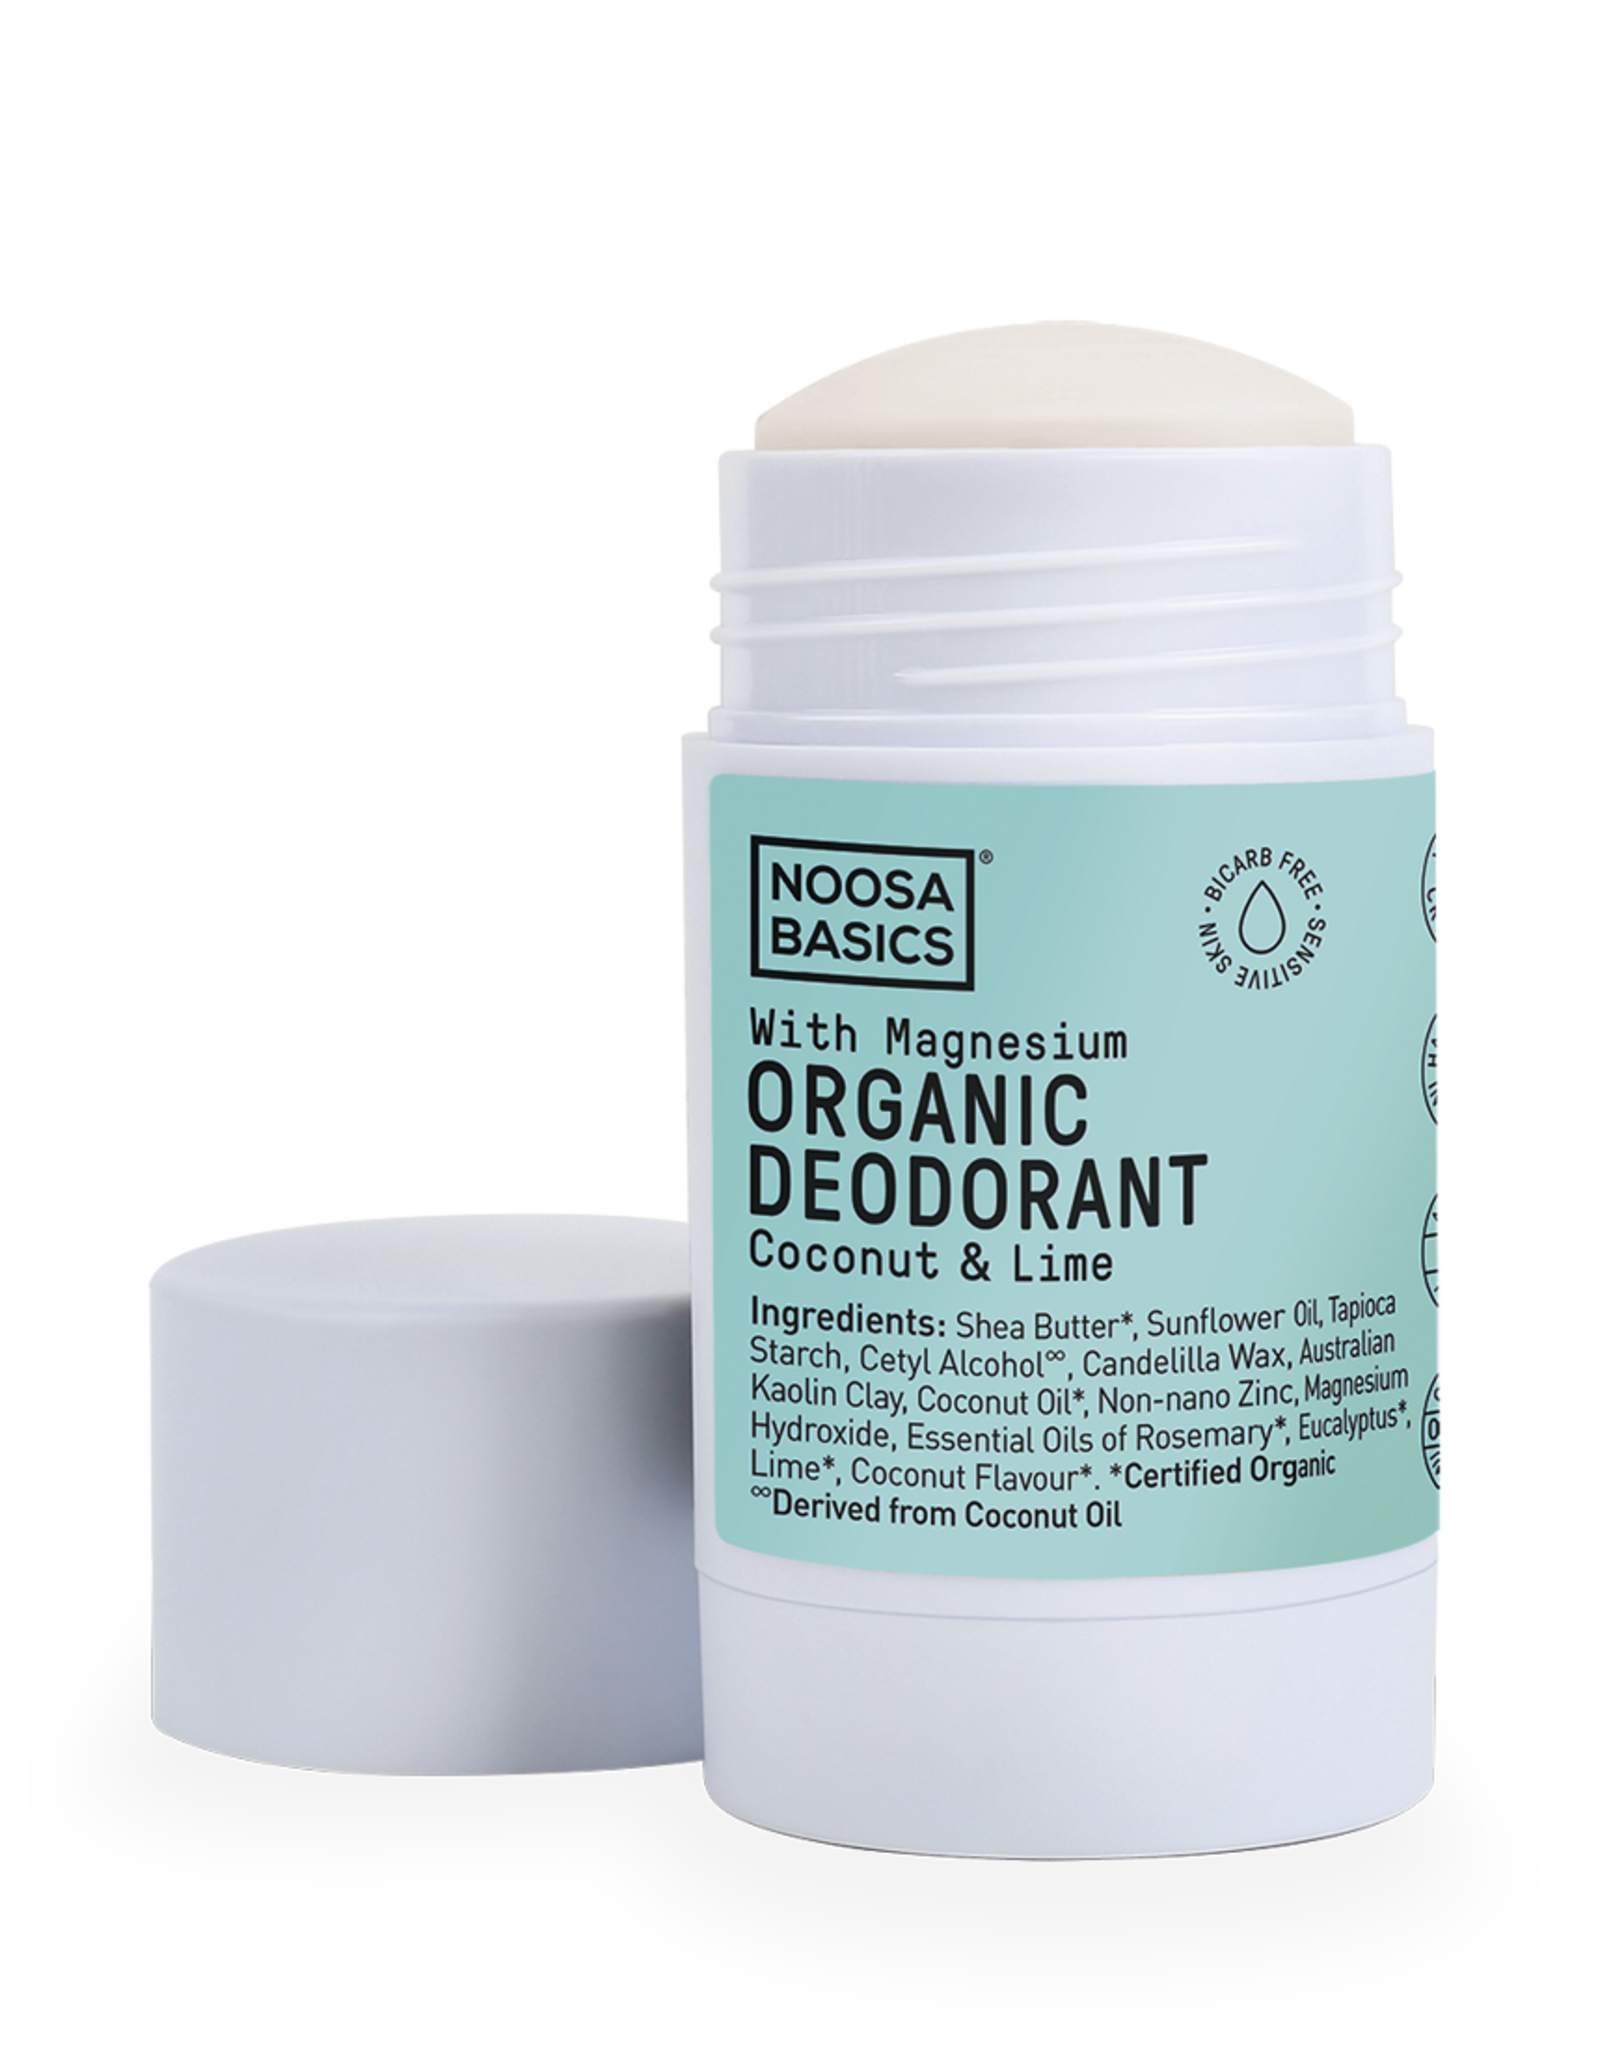 Noosa Basics Deodorant Stick with Magnesium - Coconut & Lime 60g